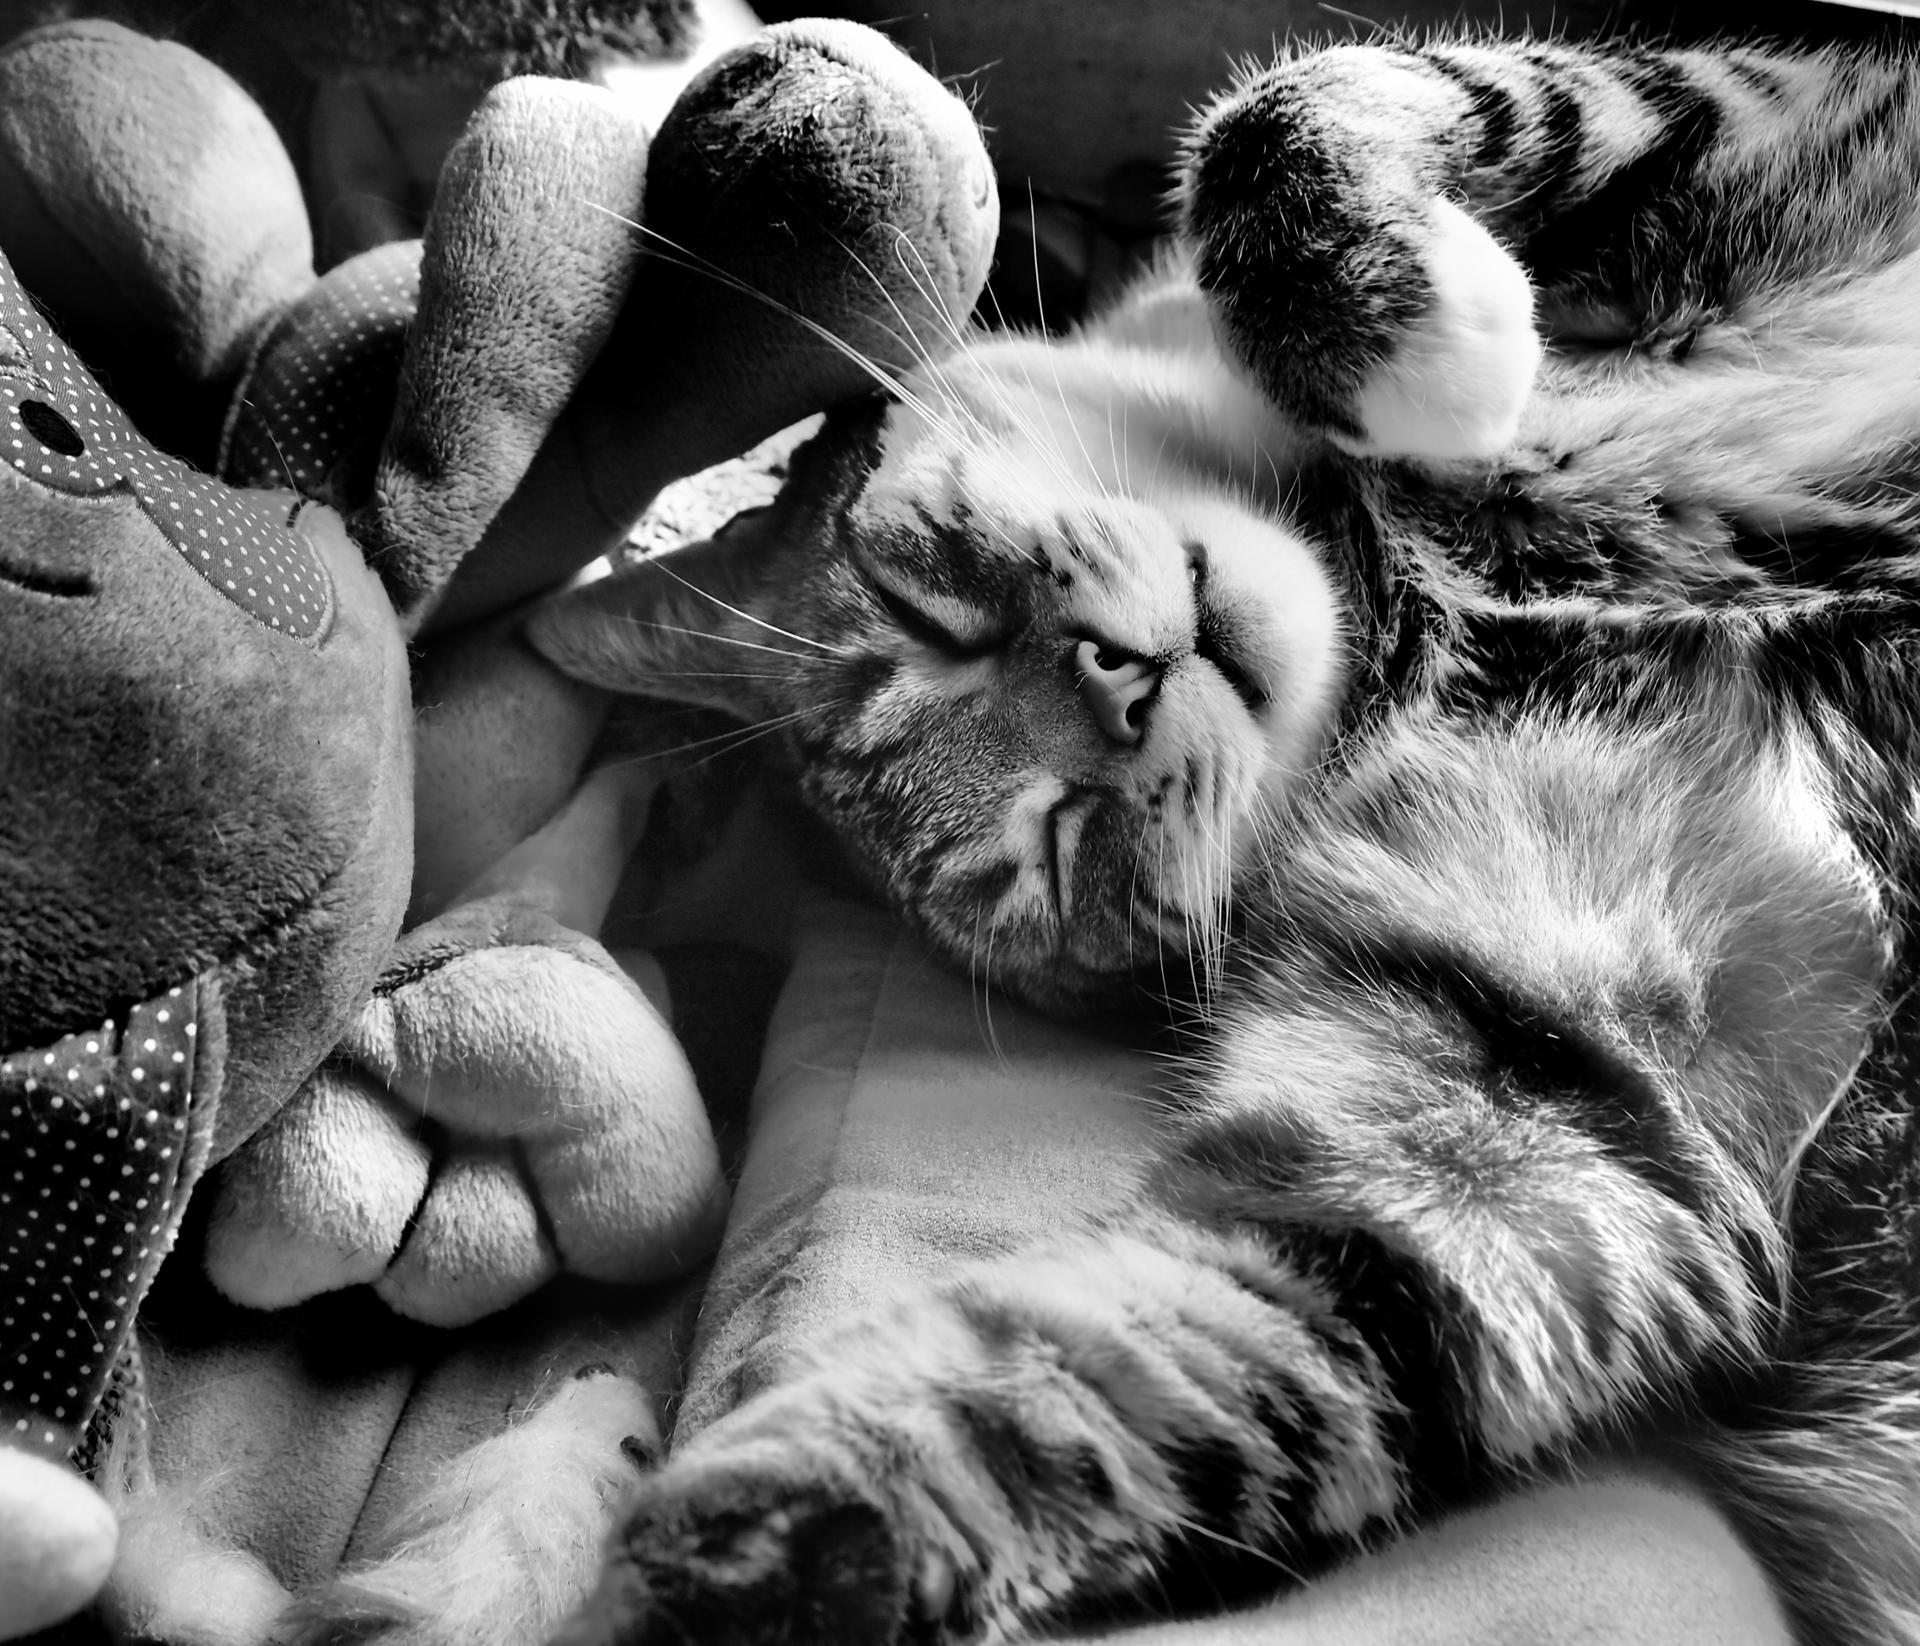 Gus rêve.